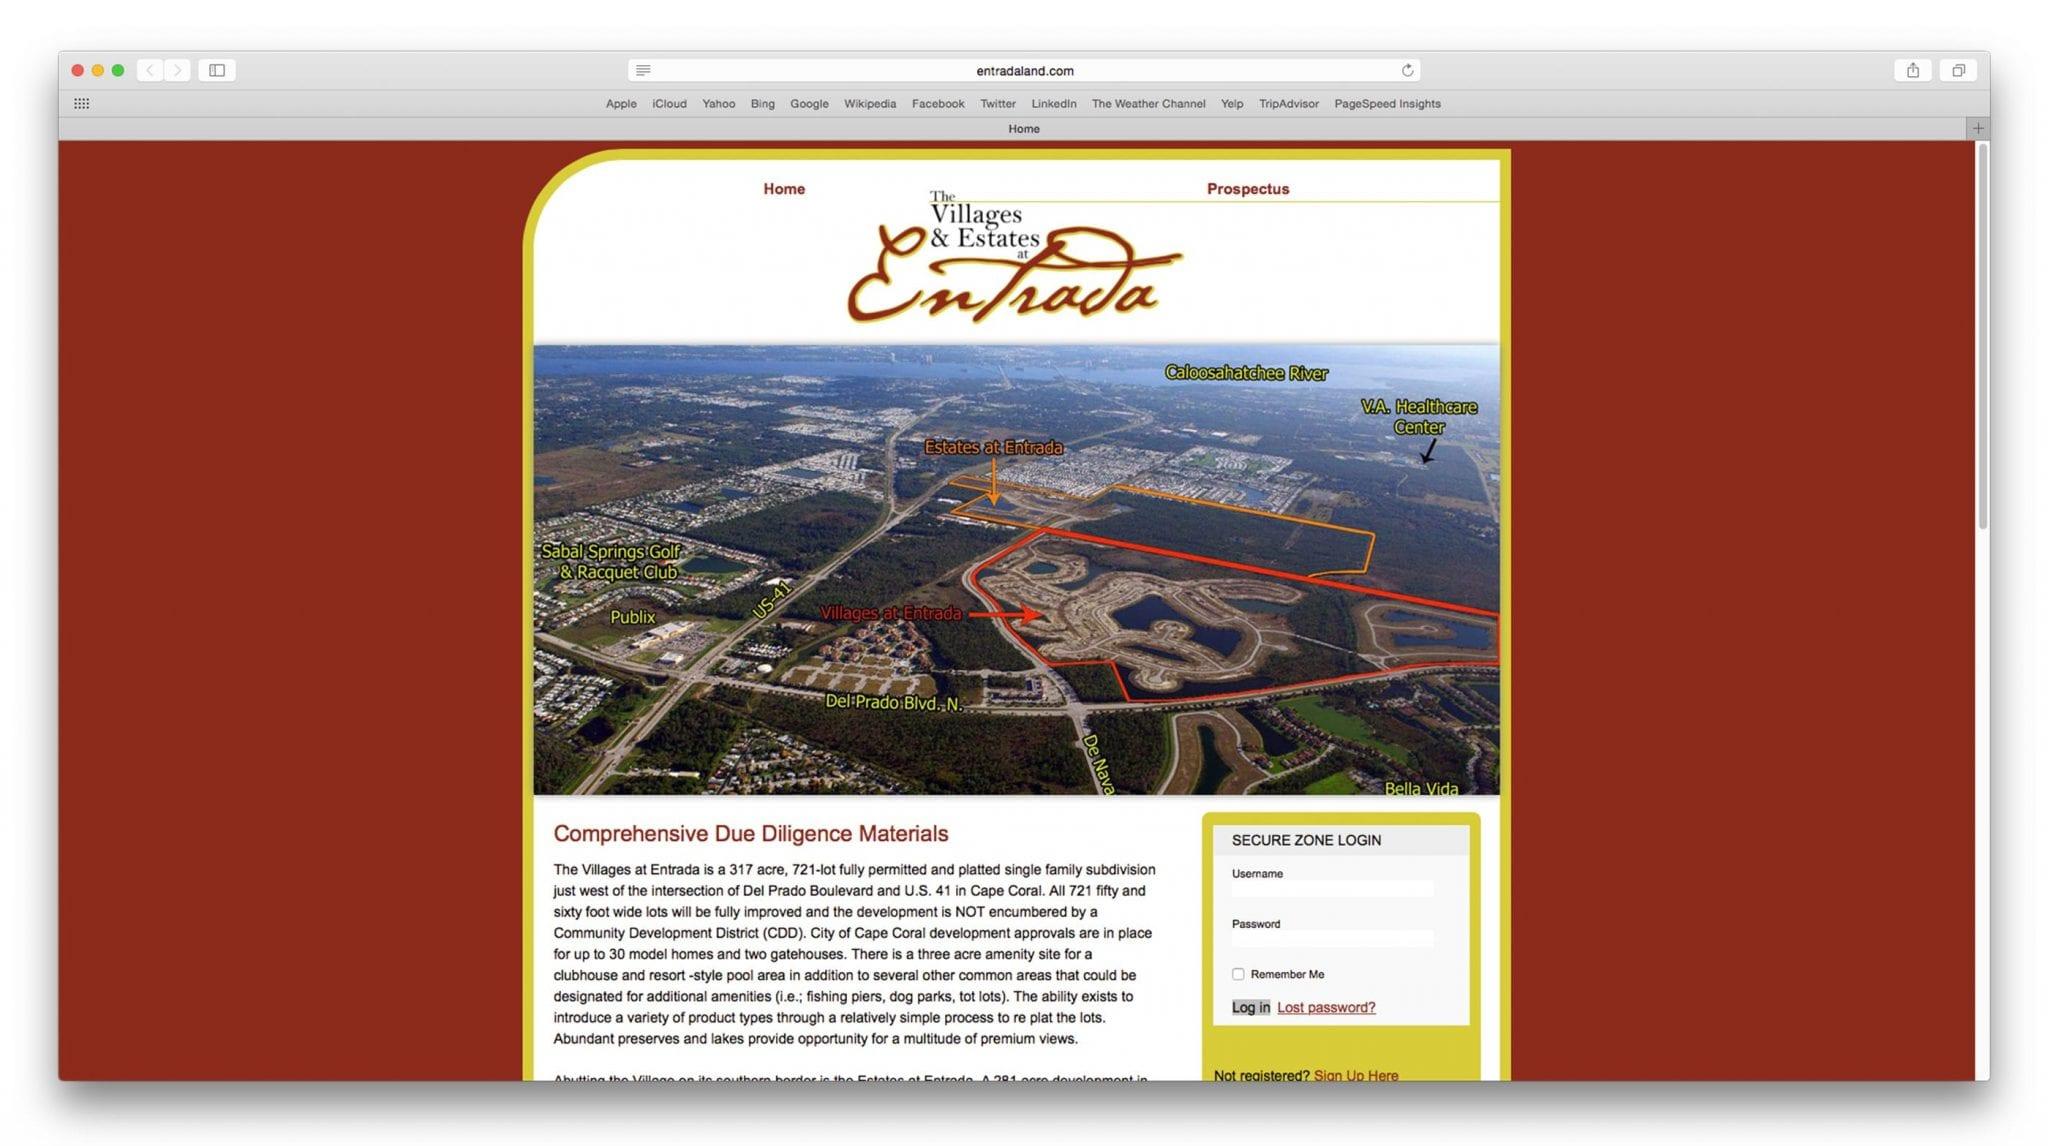 entradawebsite